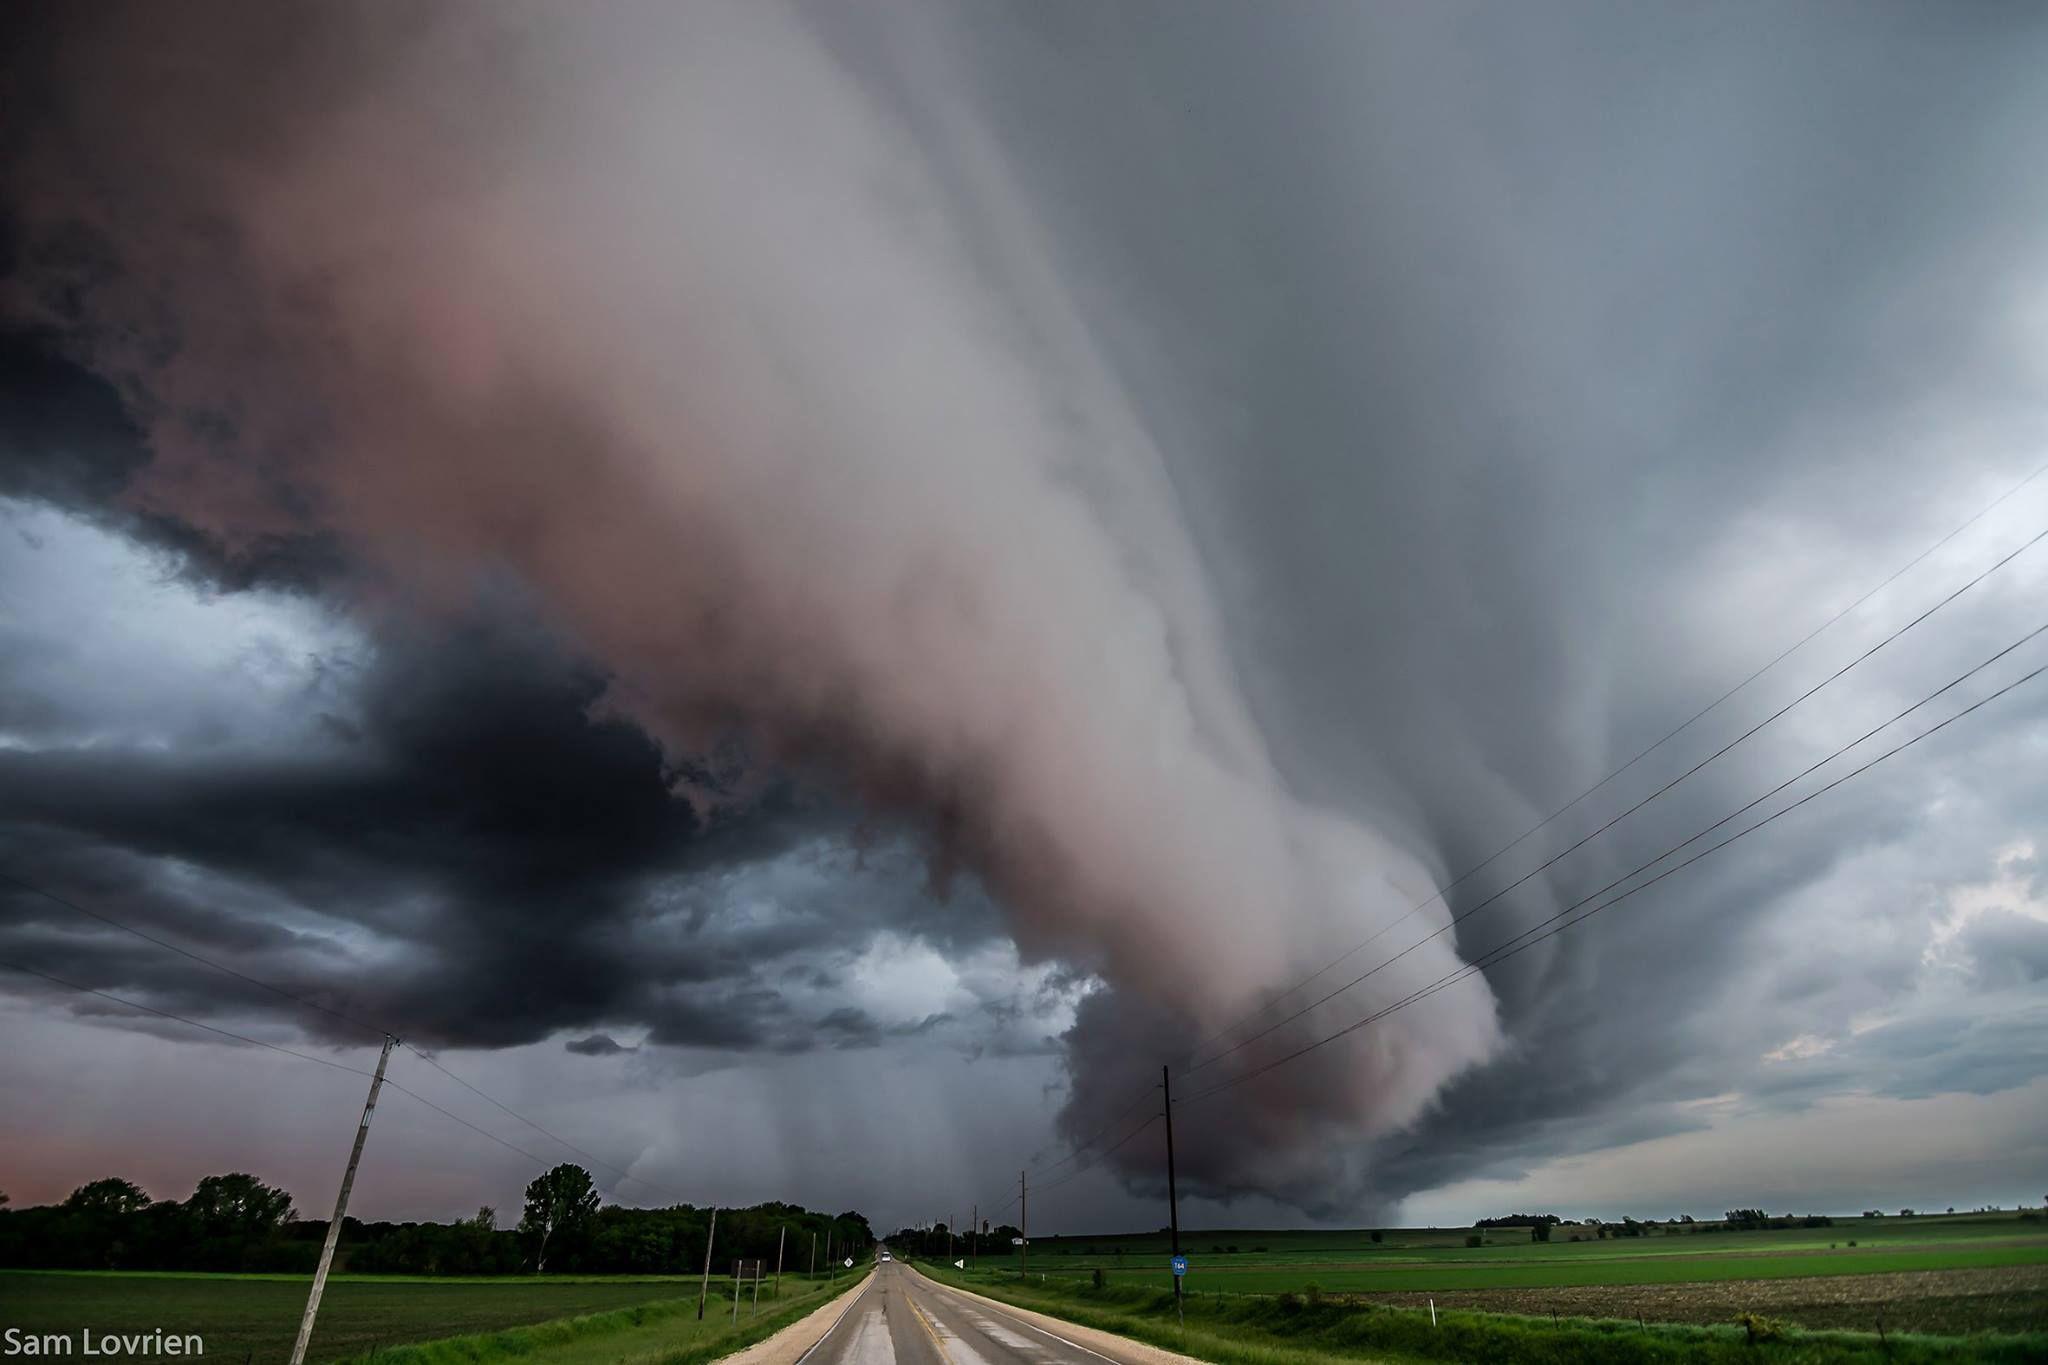 Sam Lovrien Iowa Storm Photography Near Charles City Iowa